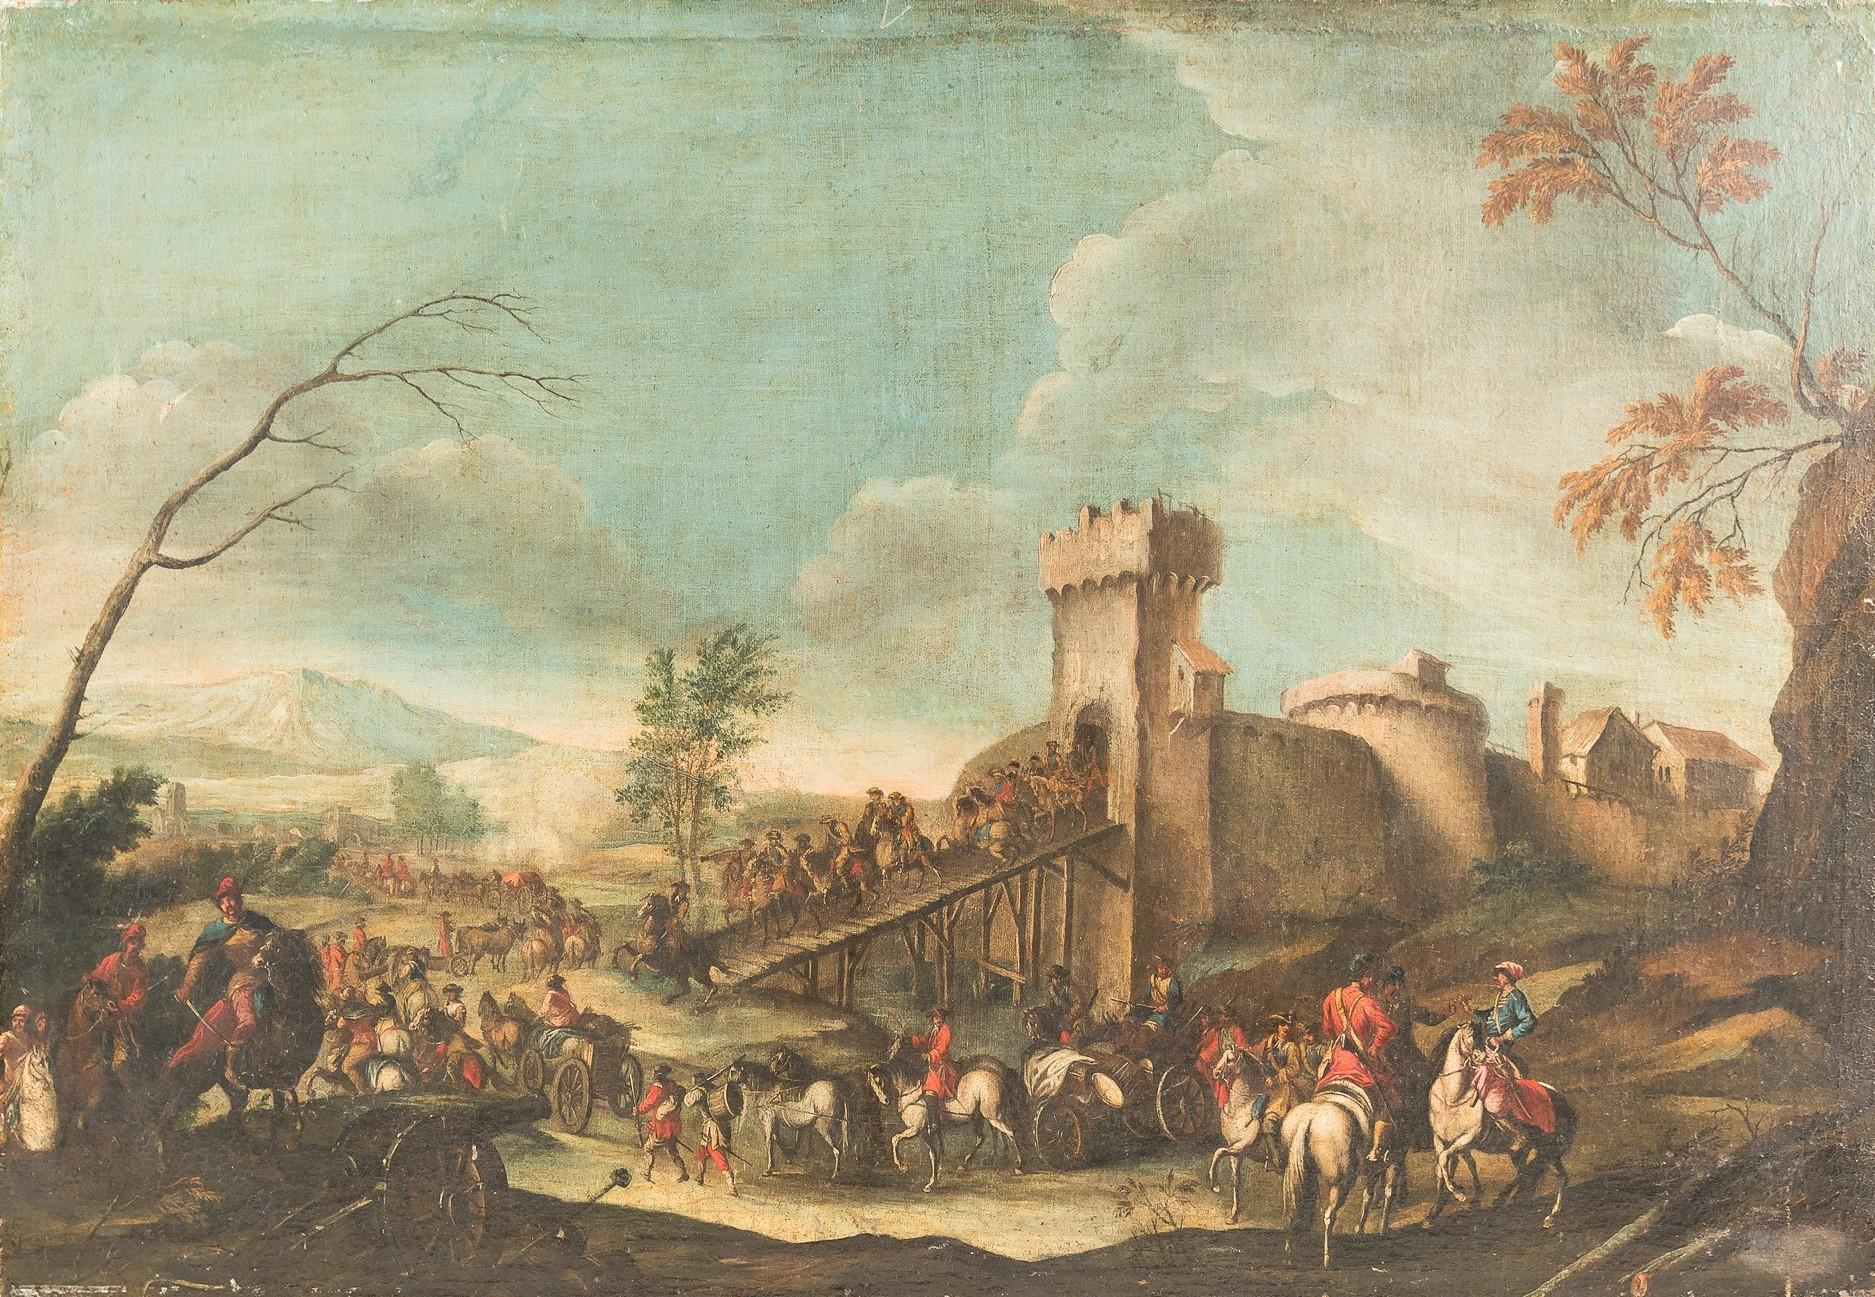 18th century Italian landscape painting - Battle oil on canvas - Italy Louis XIV